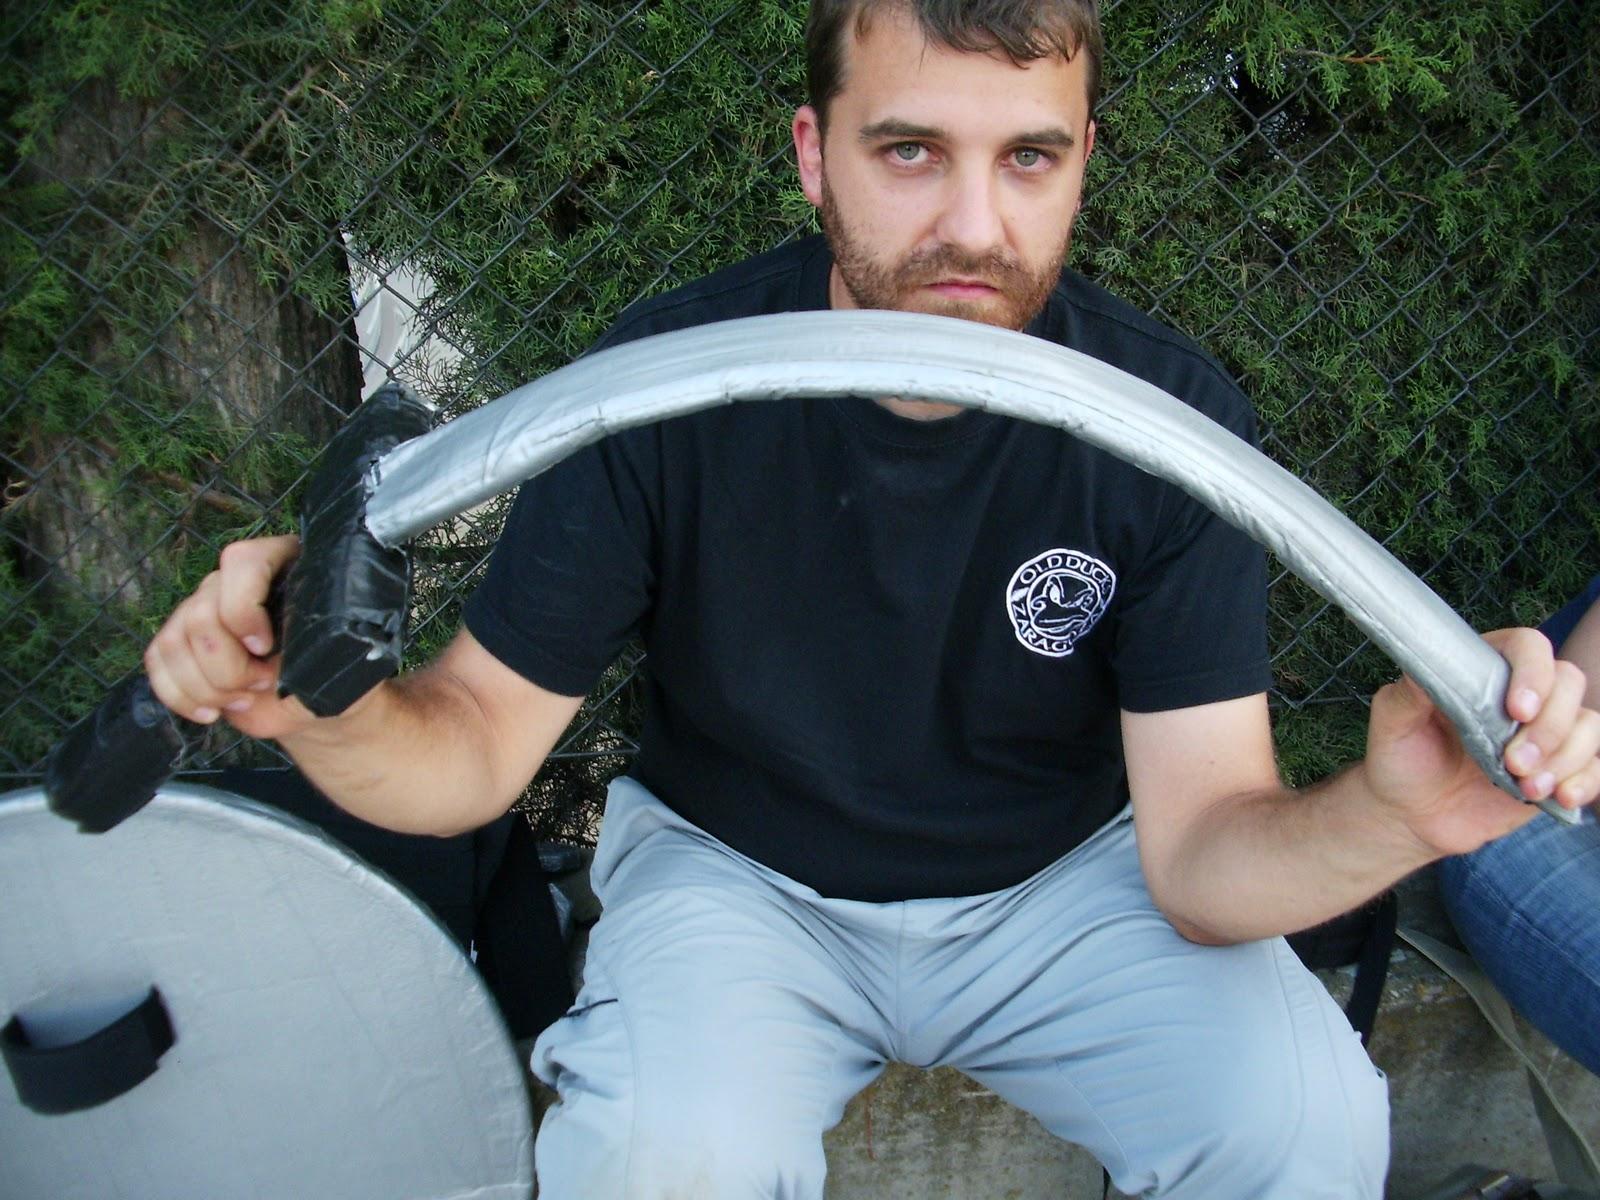 Las forjas de skilfngheim c mo fabricar espadas de - Varillas fibra de vidrio ...